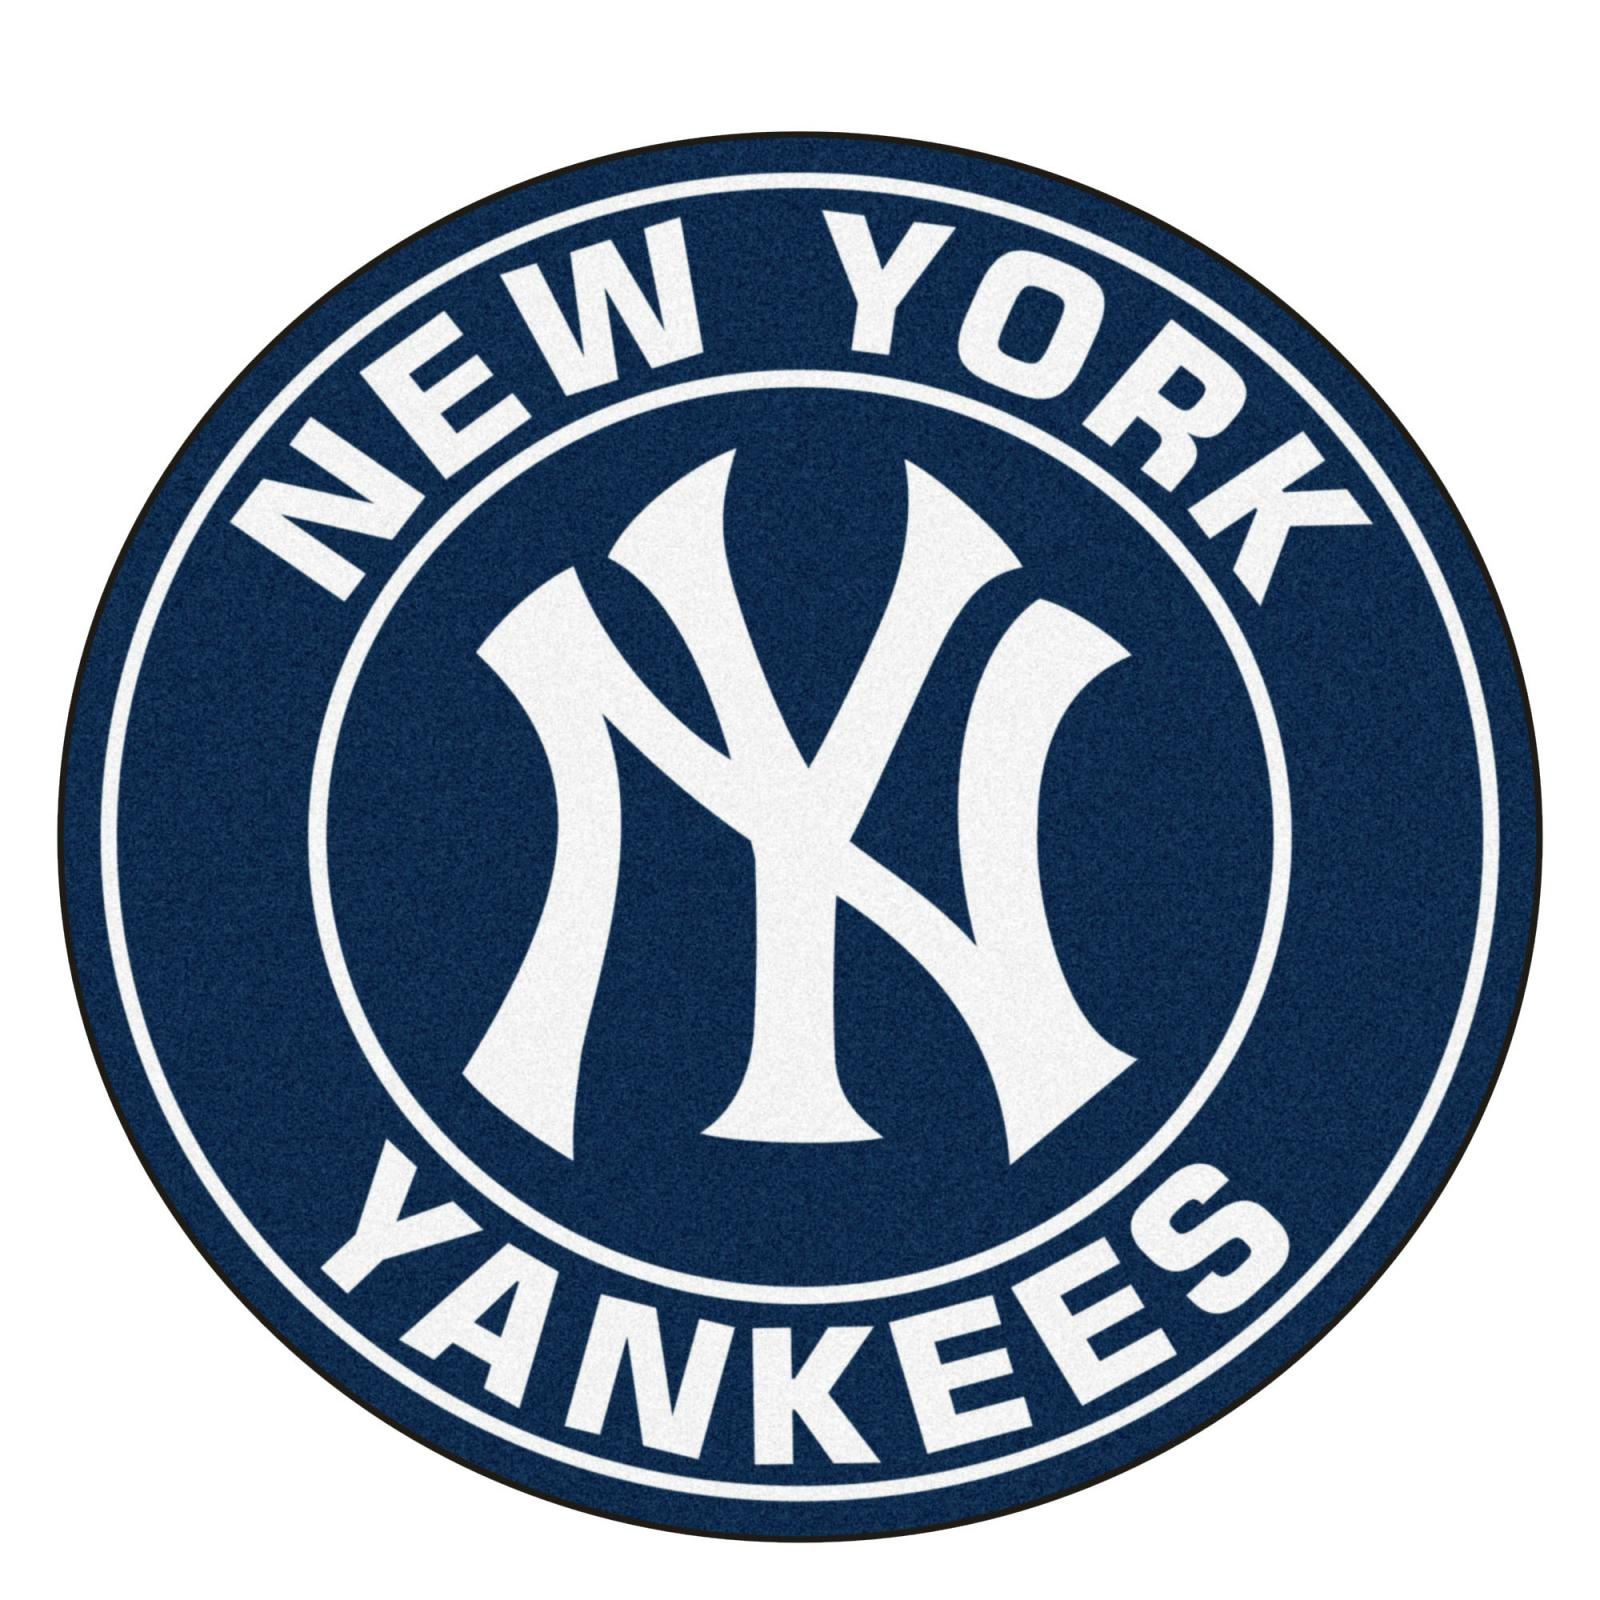 New york yankees new era hat cap 2017 mlb spring training 59fifty new york yankees new era 2017 spring training diamond era 59fifty fitted hat biocorpaavc Images